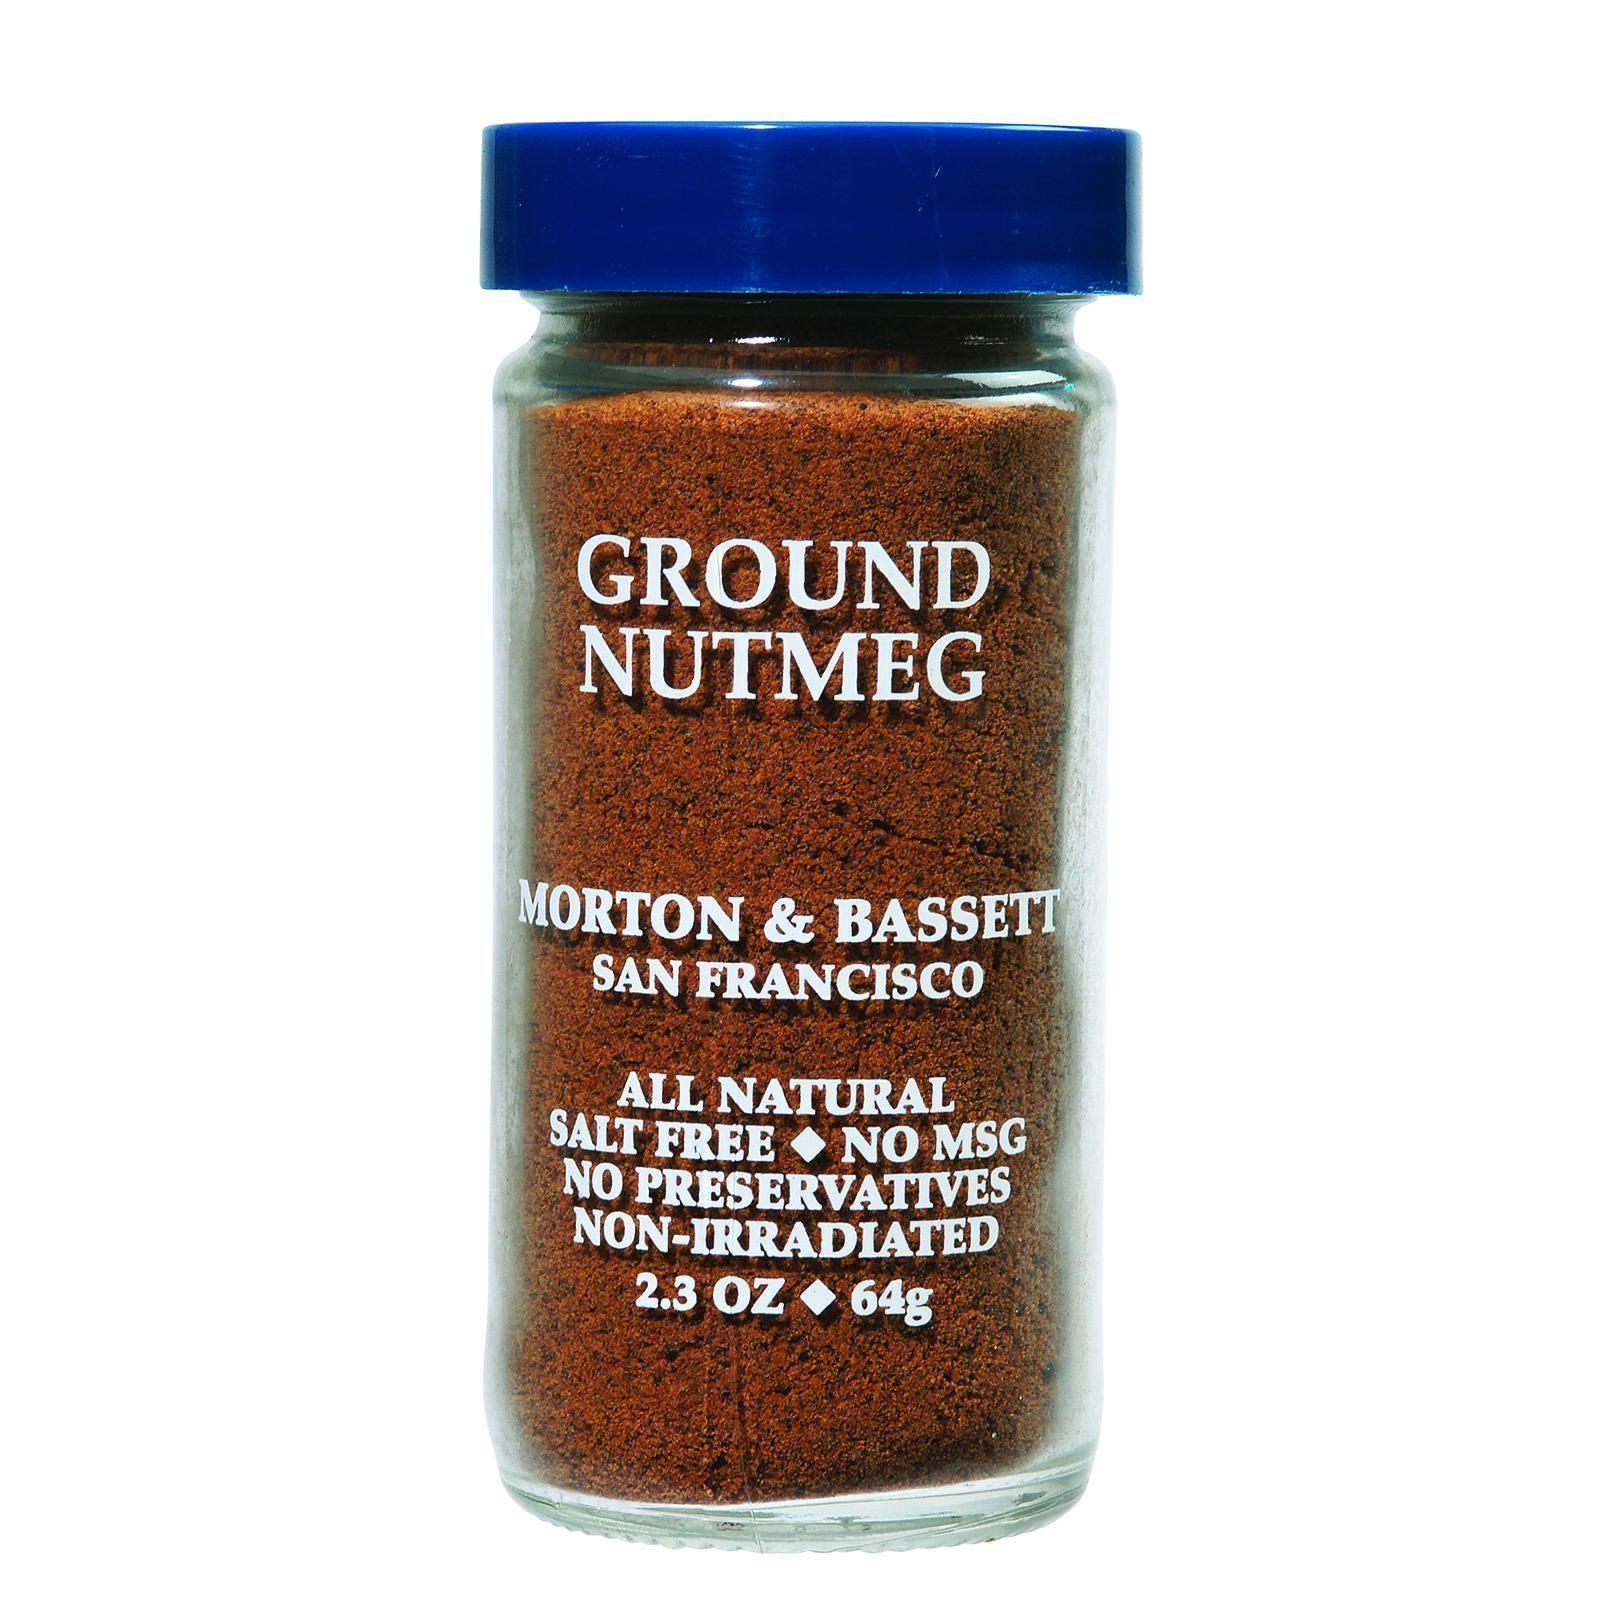 Morton and Bassett Seasoning - Nutmeg - Ground - 2.3 oz - Case of 3